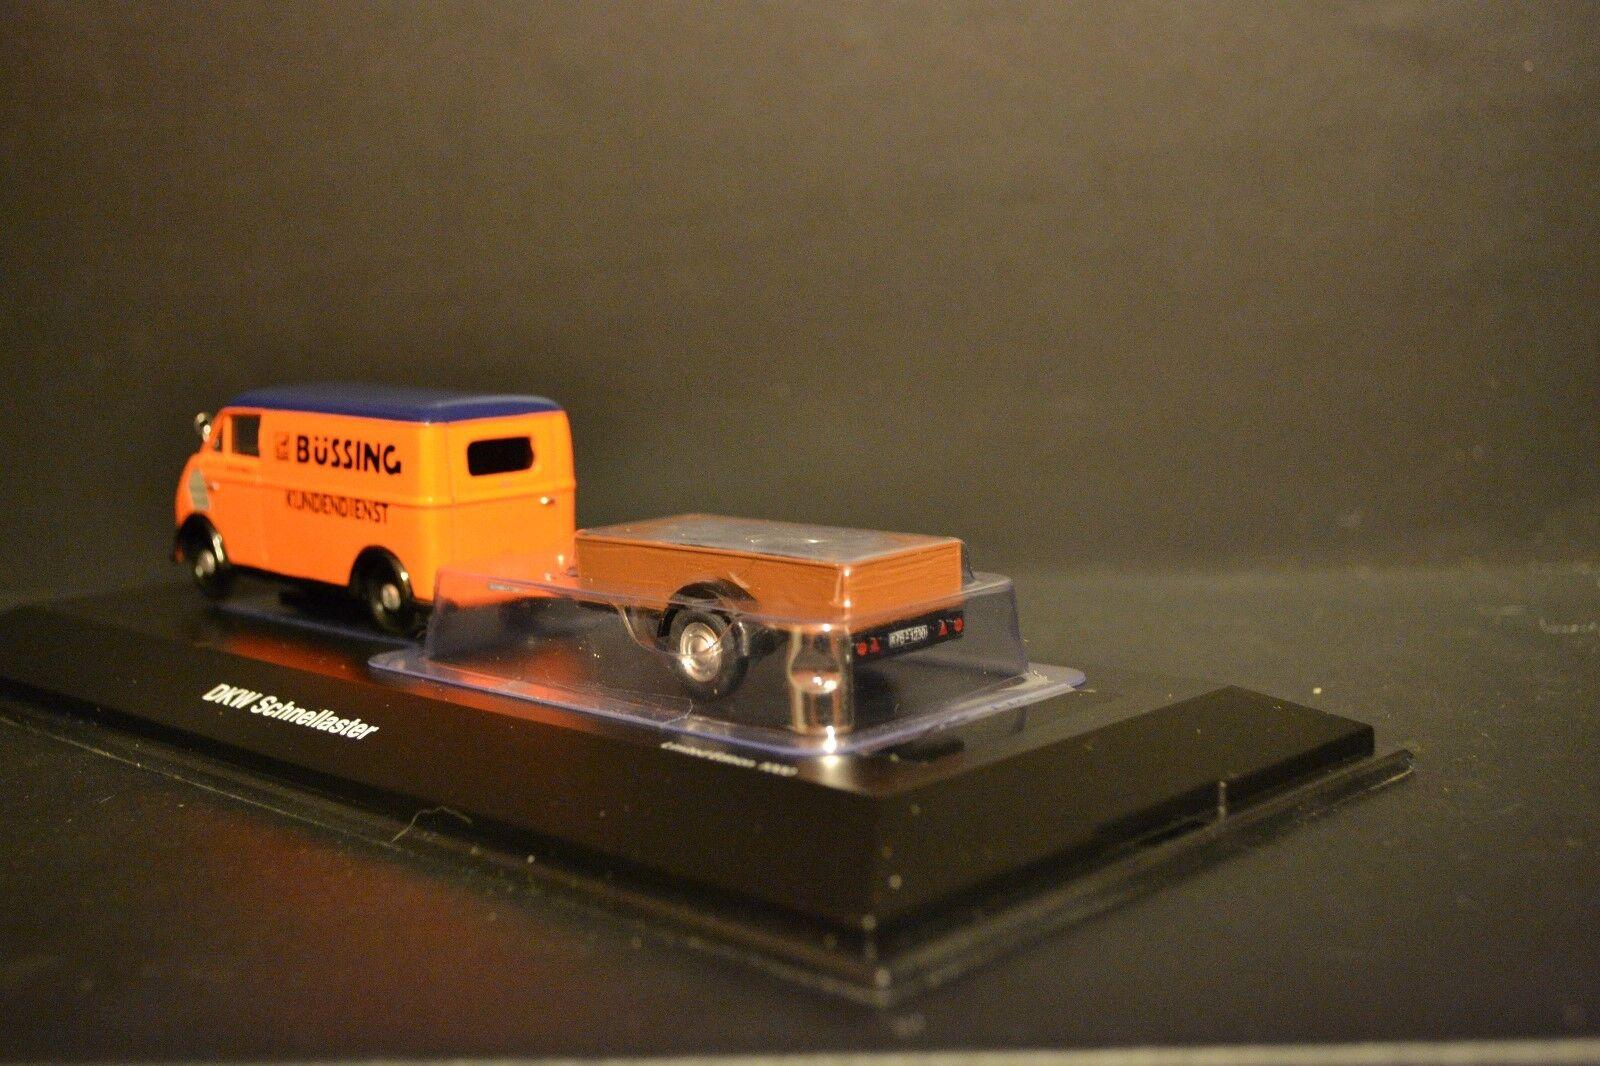 DKW Schnellaster con remolque remolque remolque Bussing en escala 1 43 Schuco Rara Edición Limitada de1c10